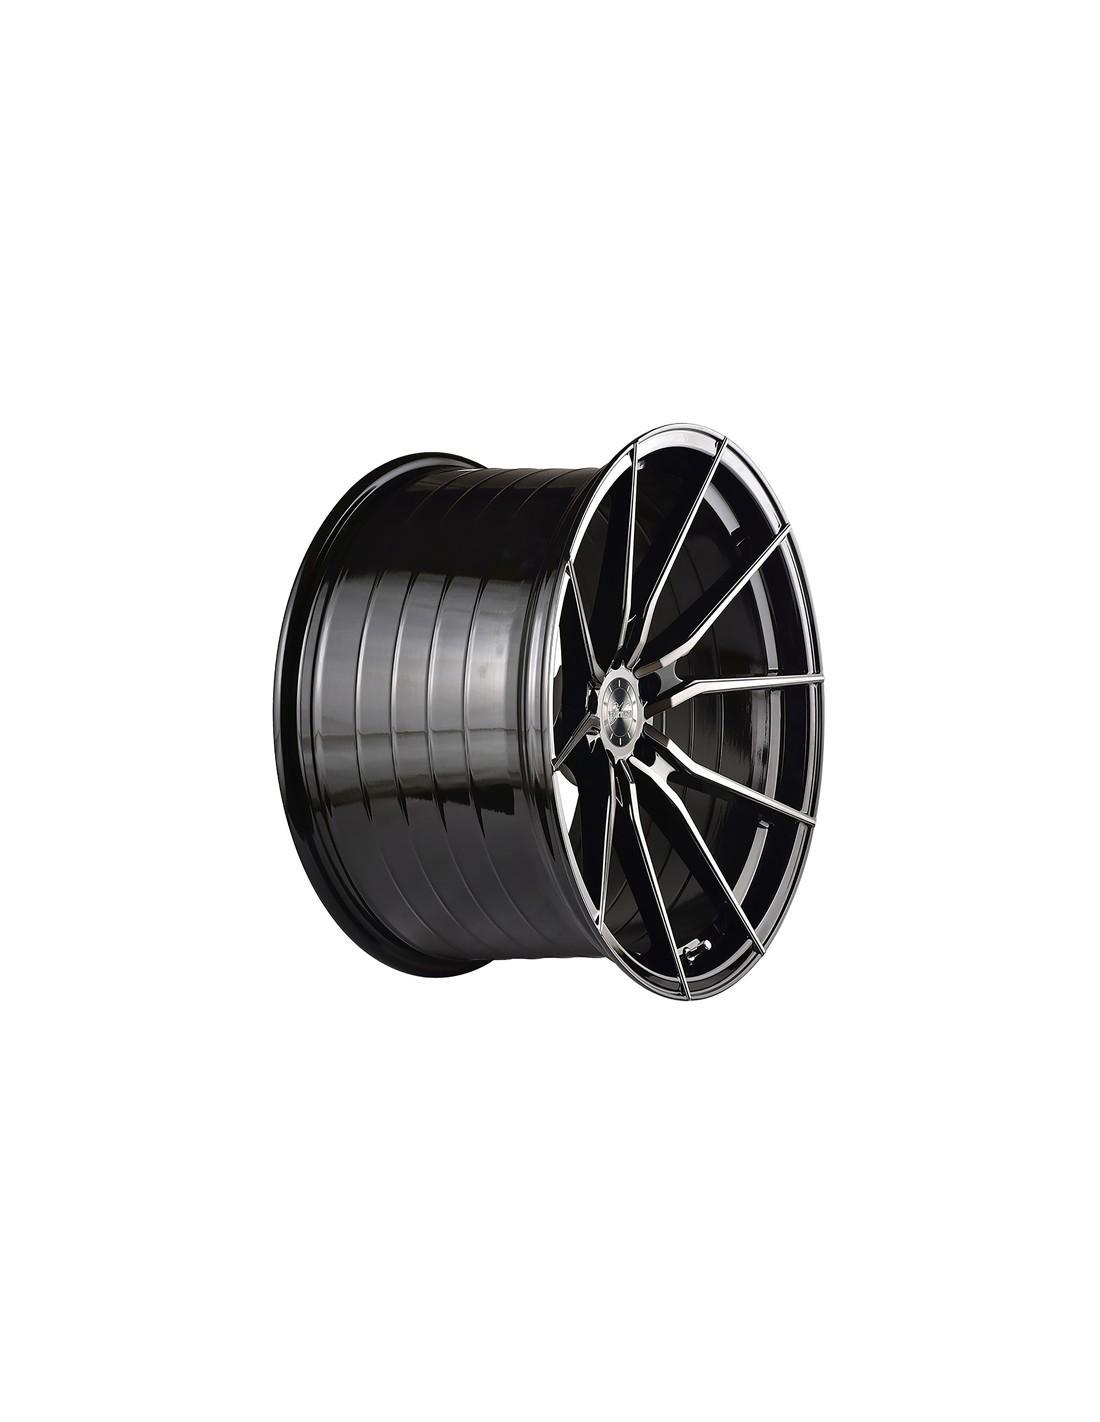 rf12--85x19-5x112-et-45-negro-tintado (2).jpg